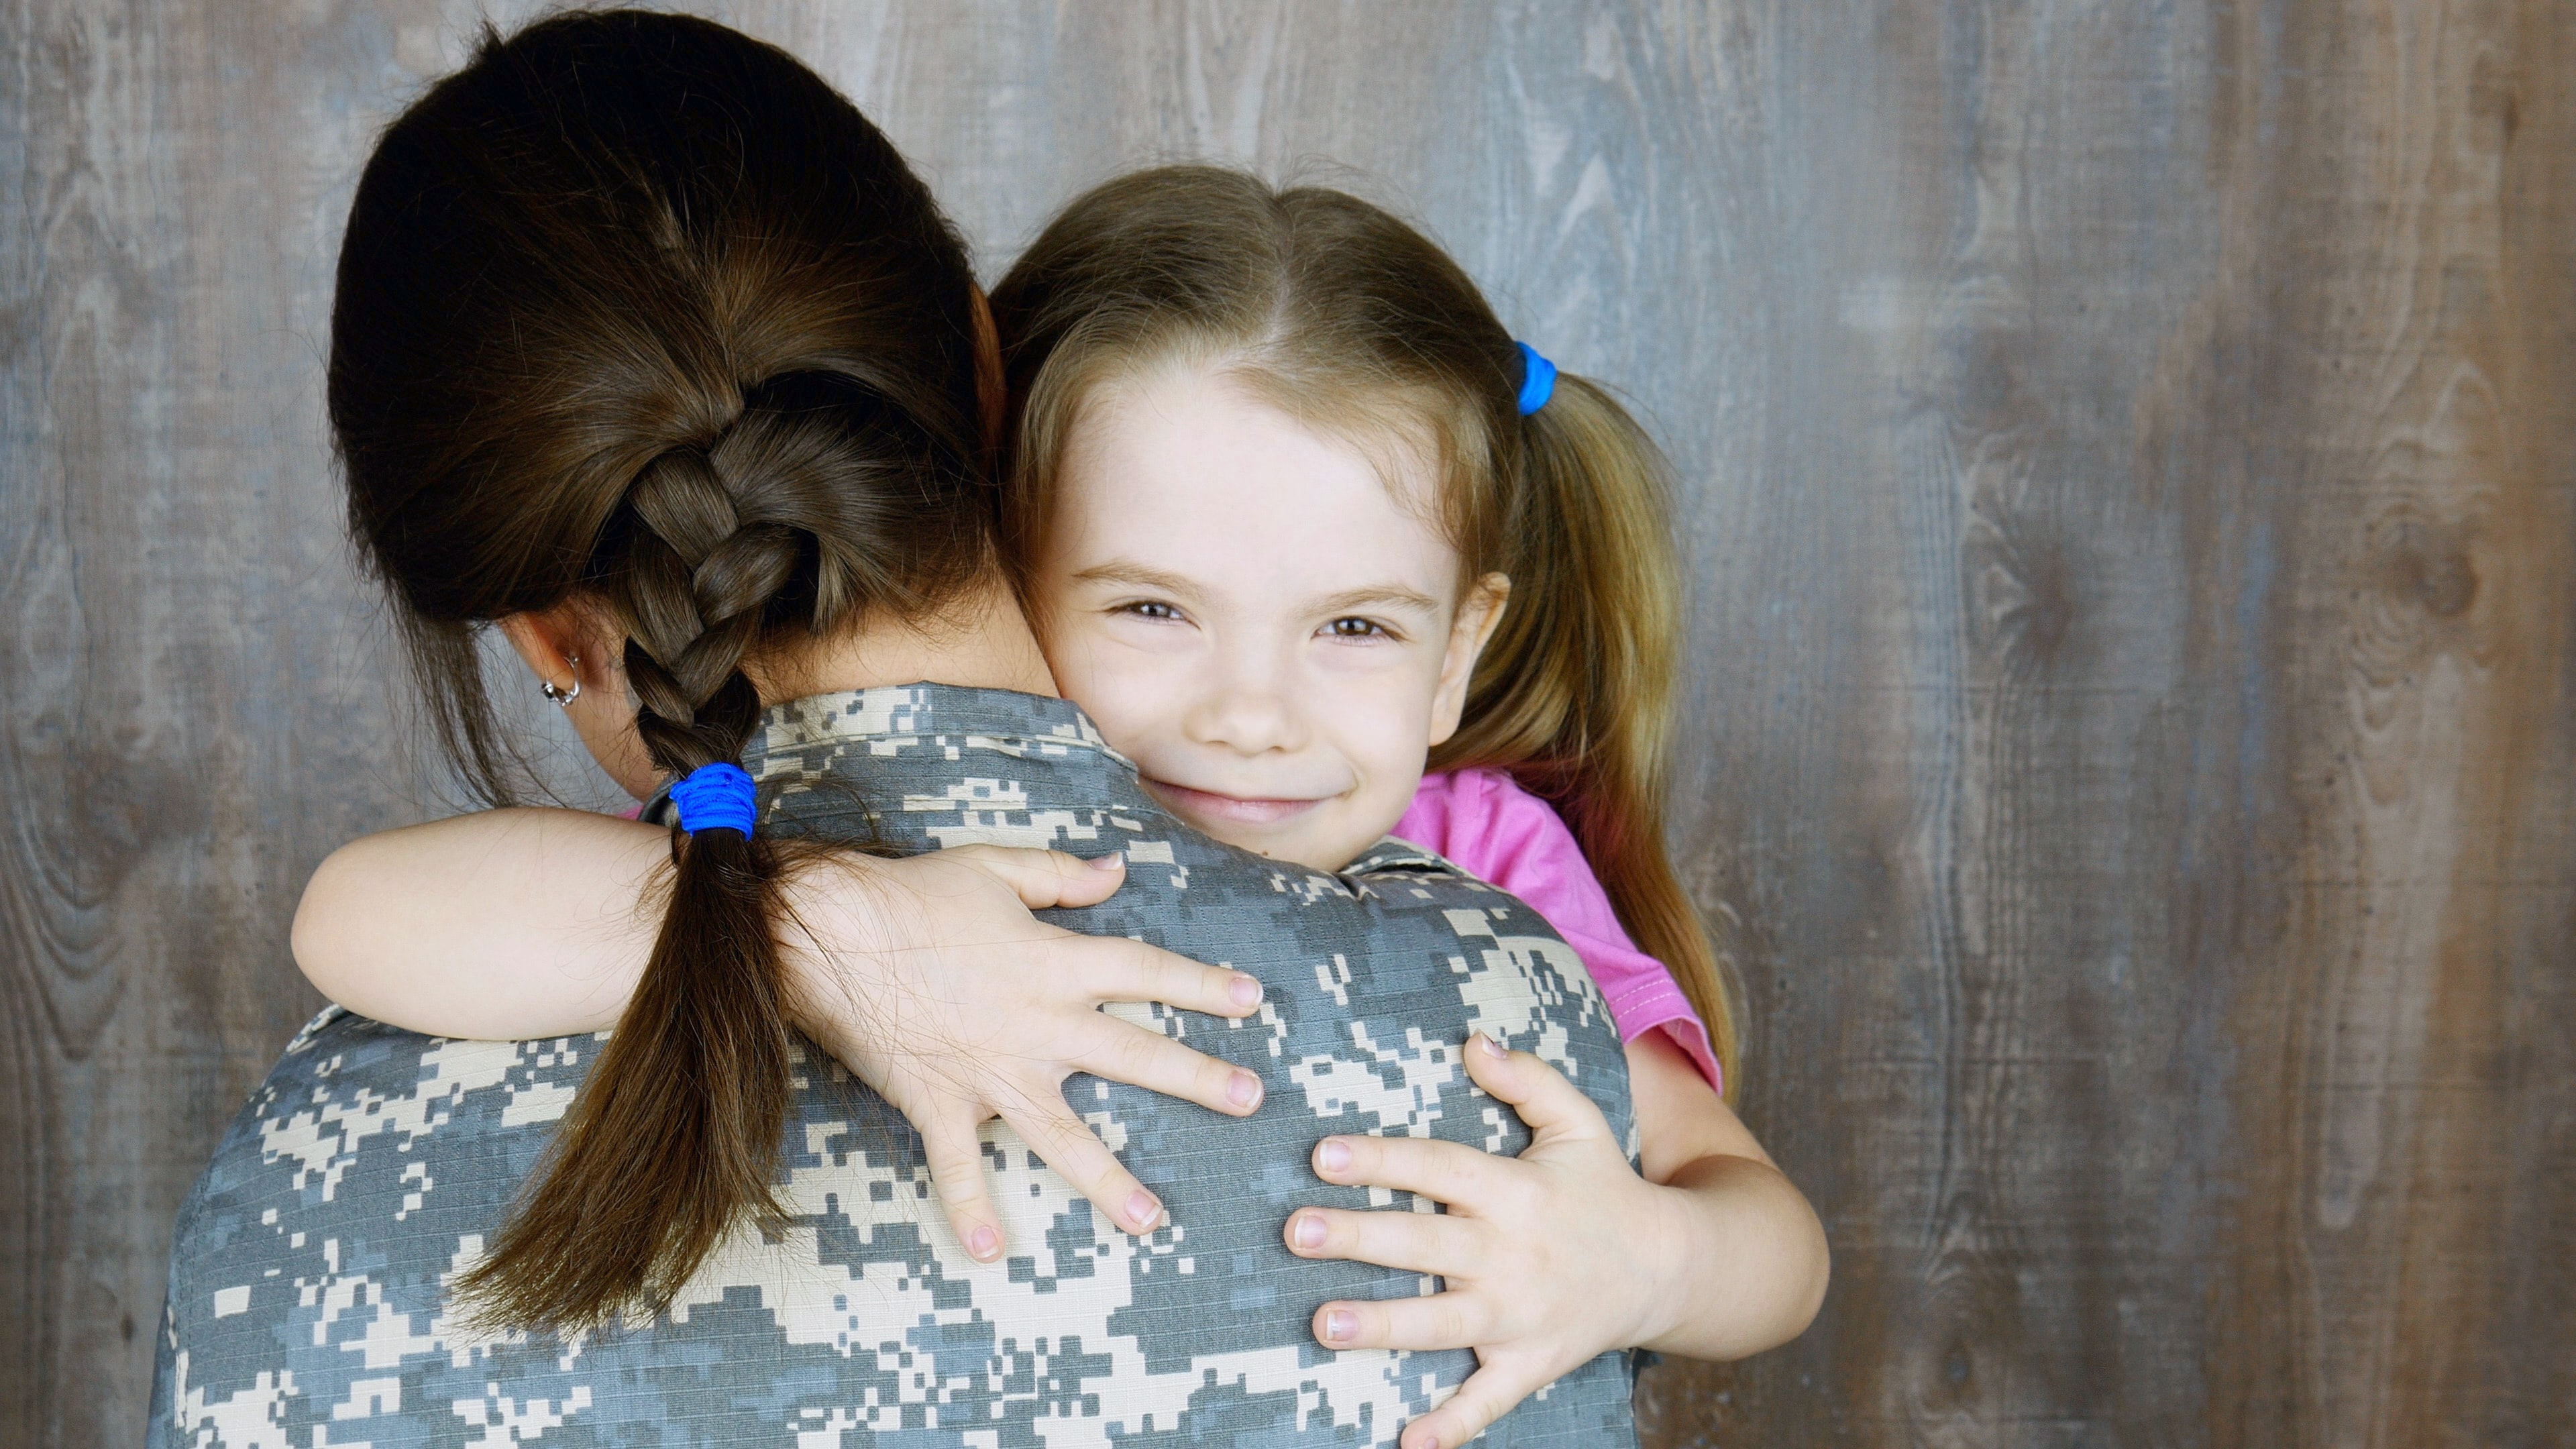 Child separation on mental health